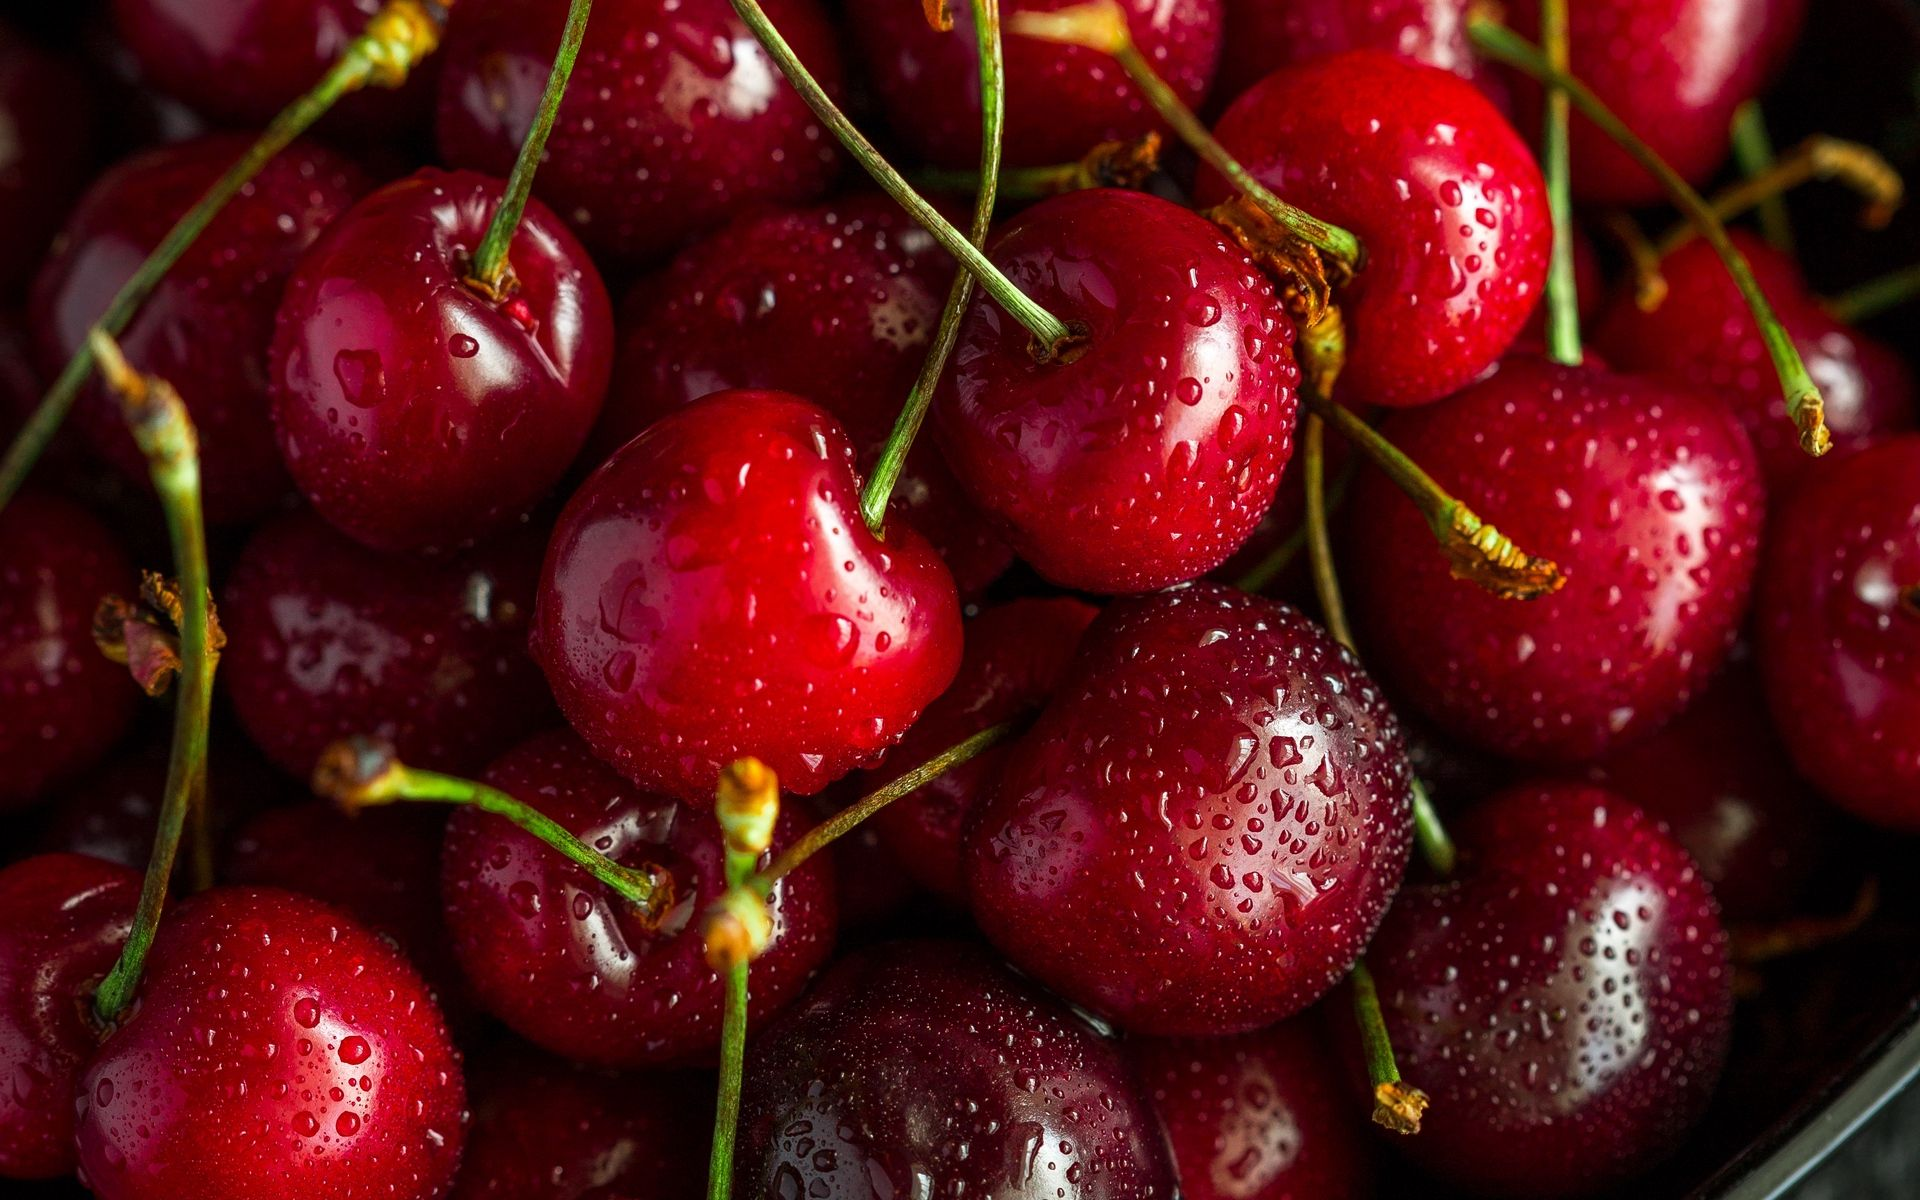 Cherries Wallpaper Hd Cherry Wallpaper Berries Hd wallpaper red fruit cherries berries